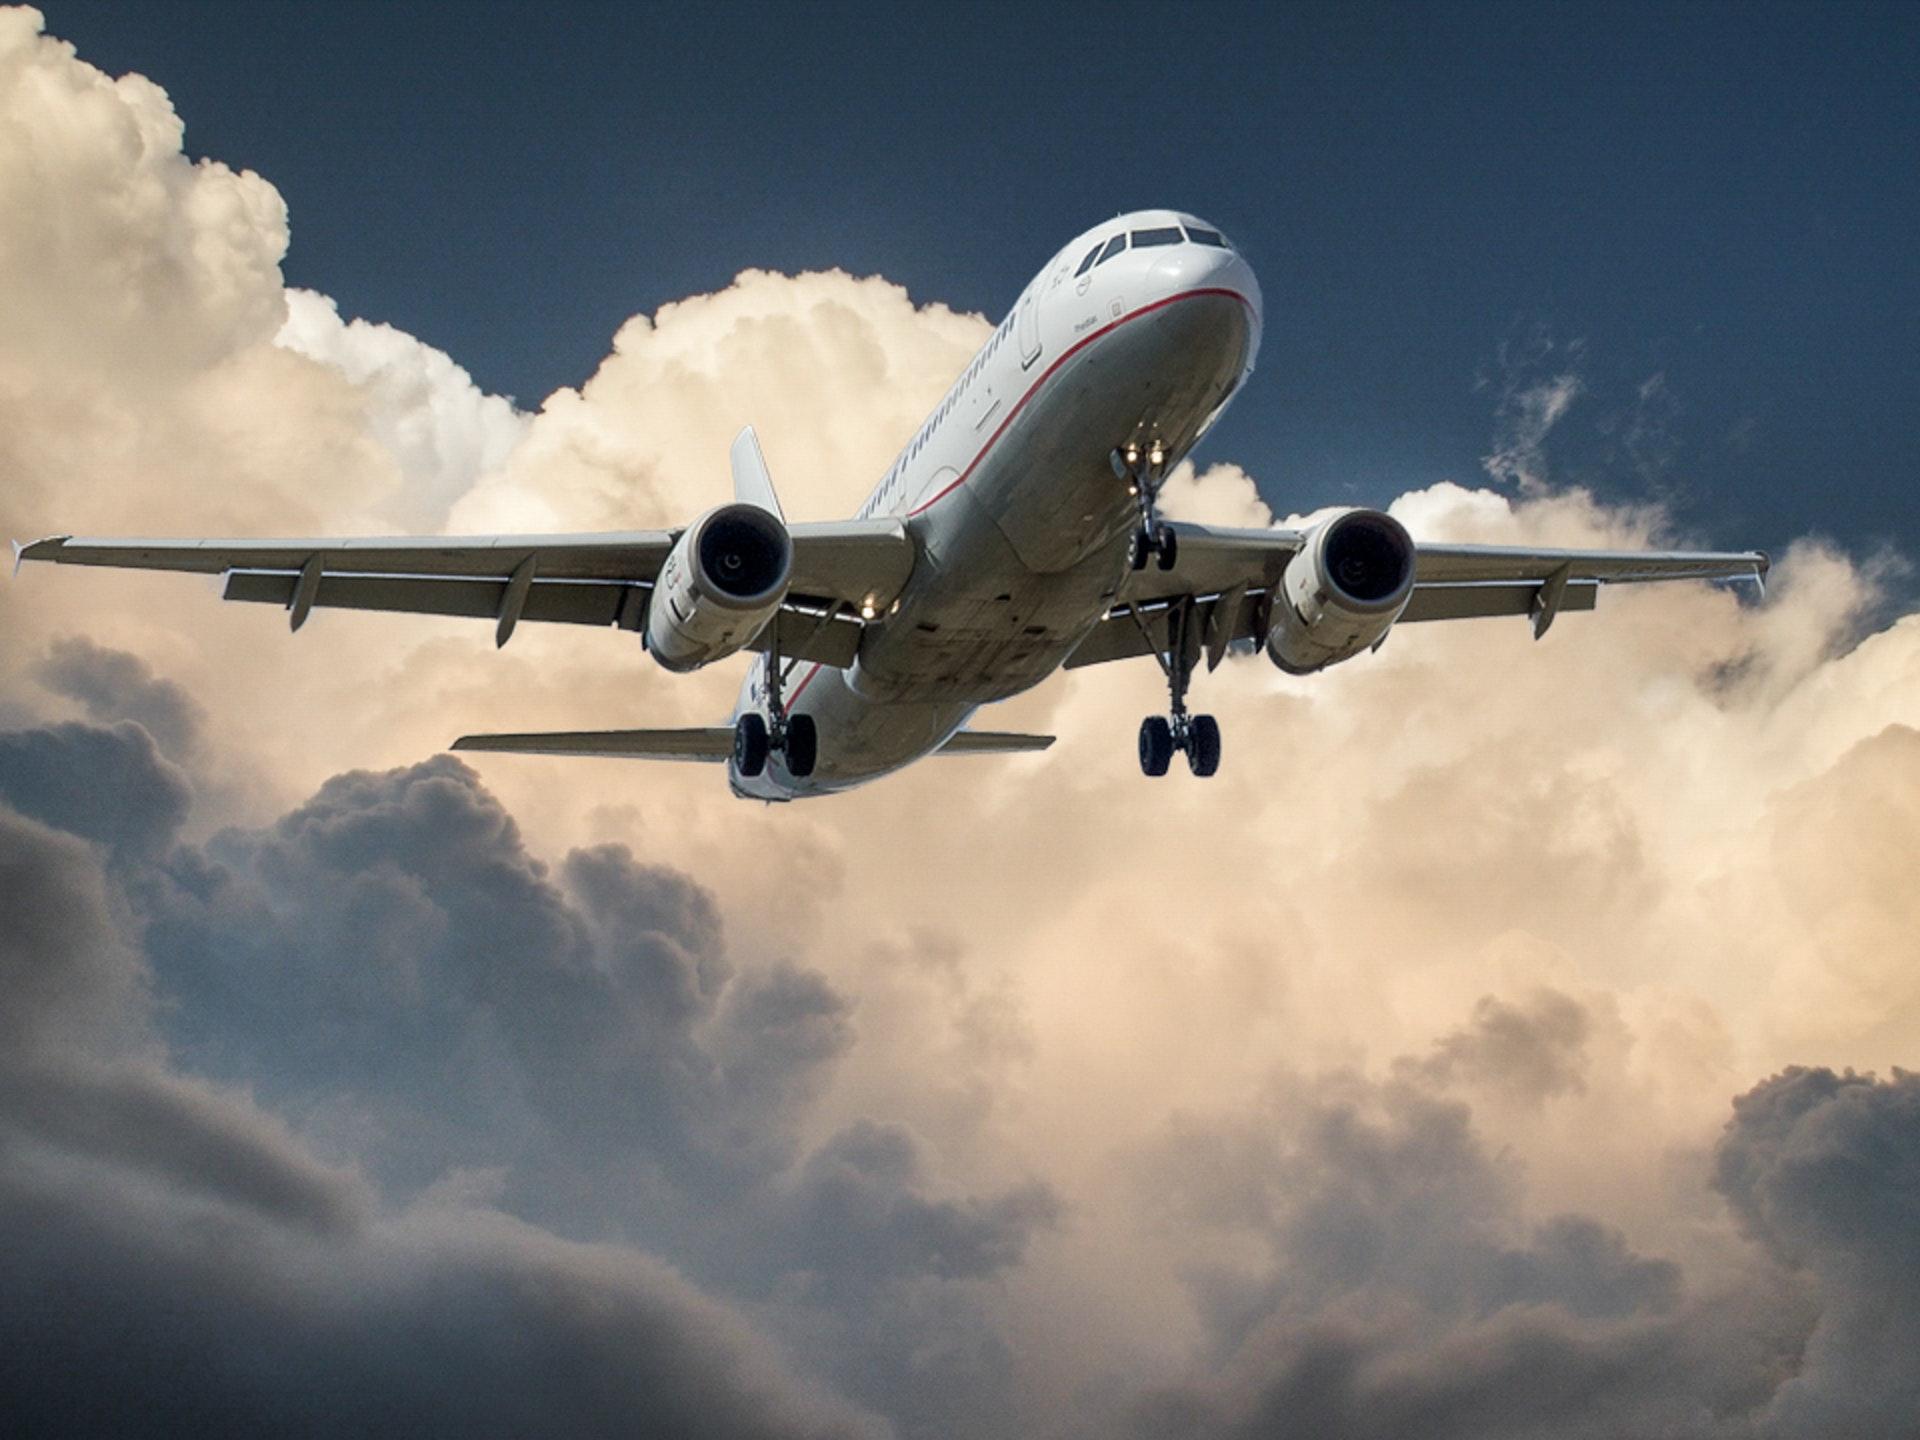 Flugreise mit Kindern